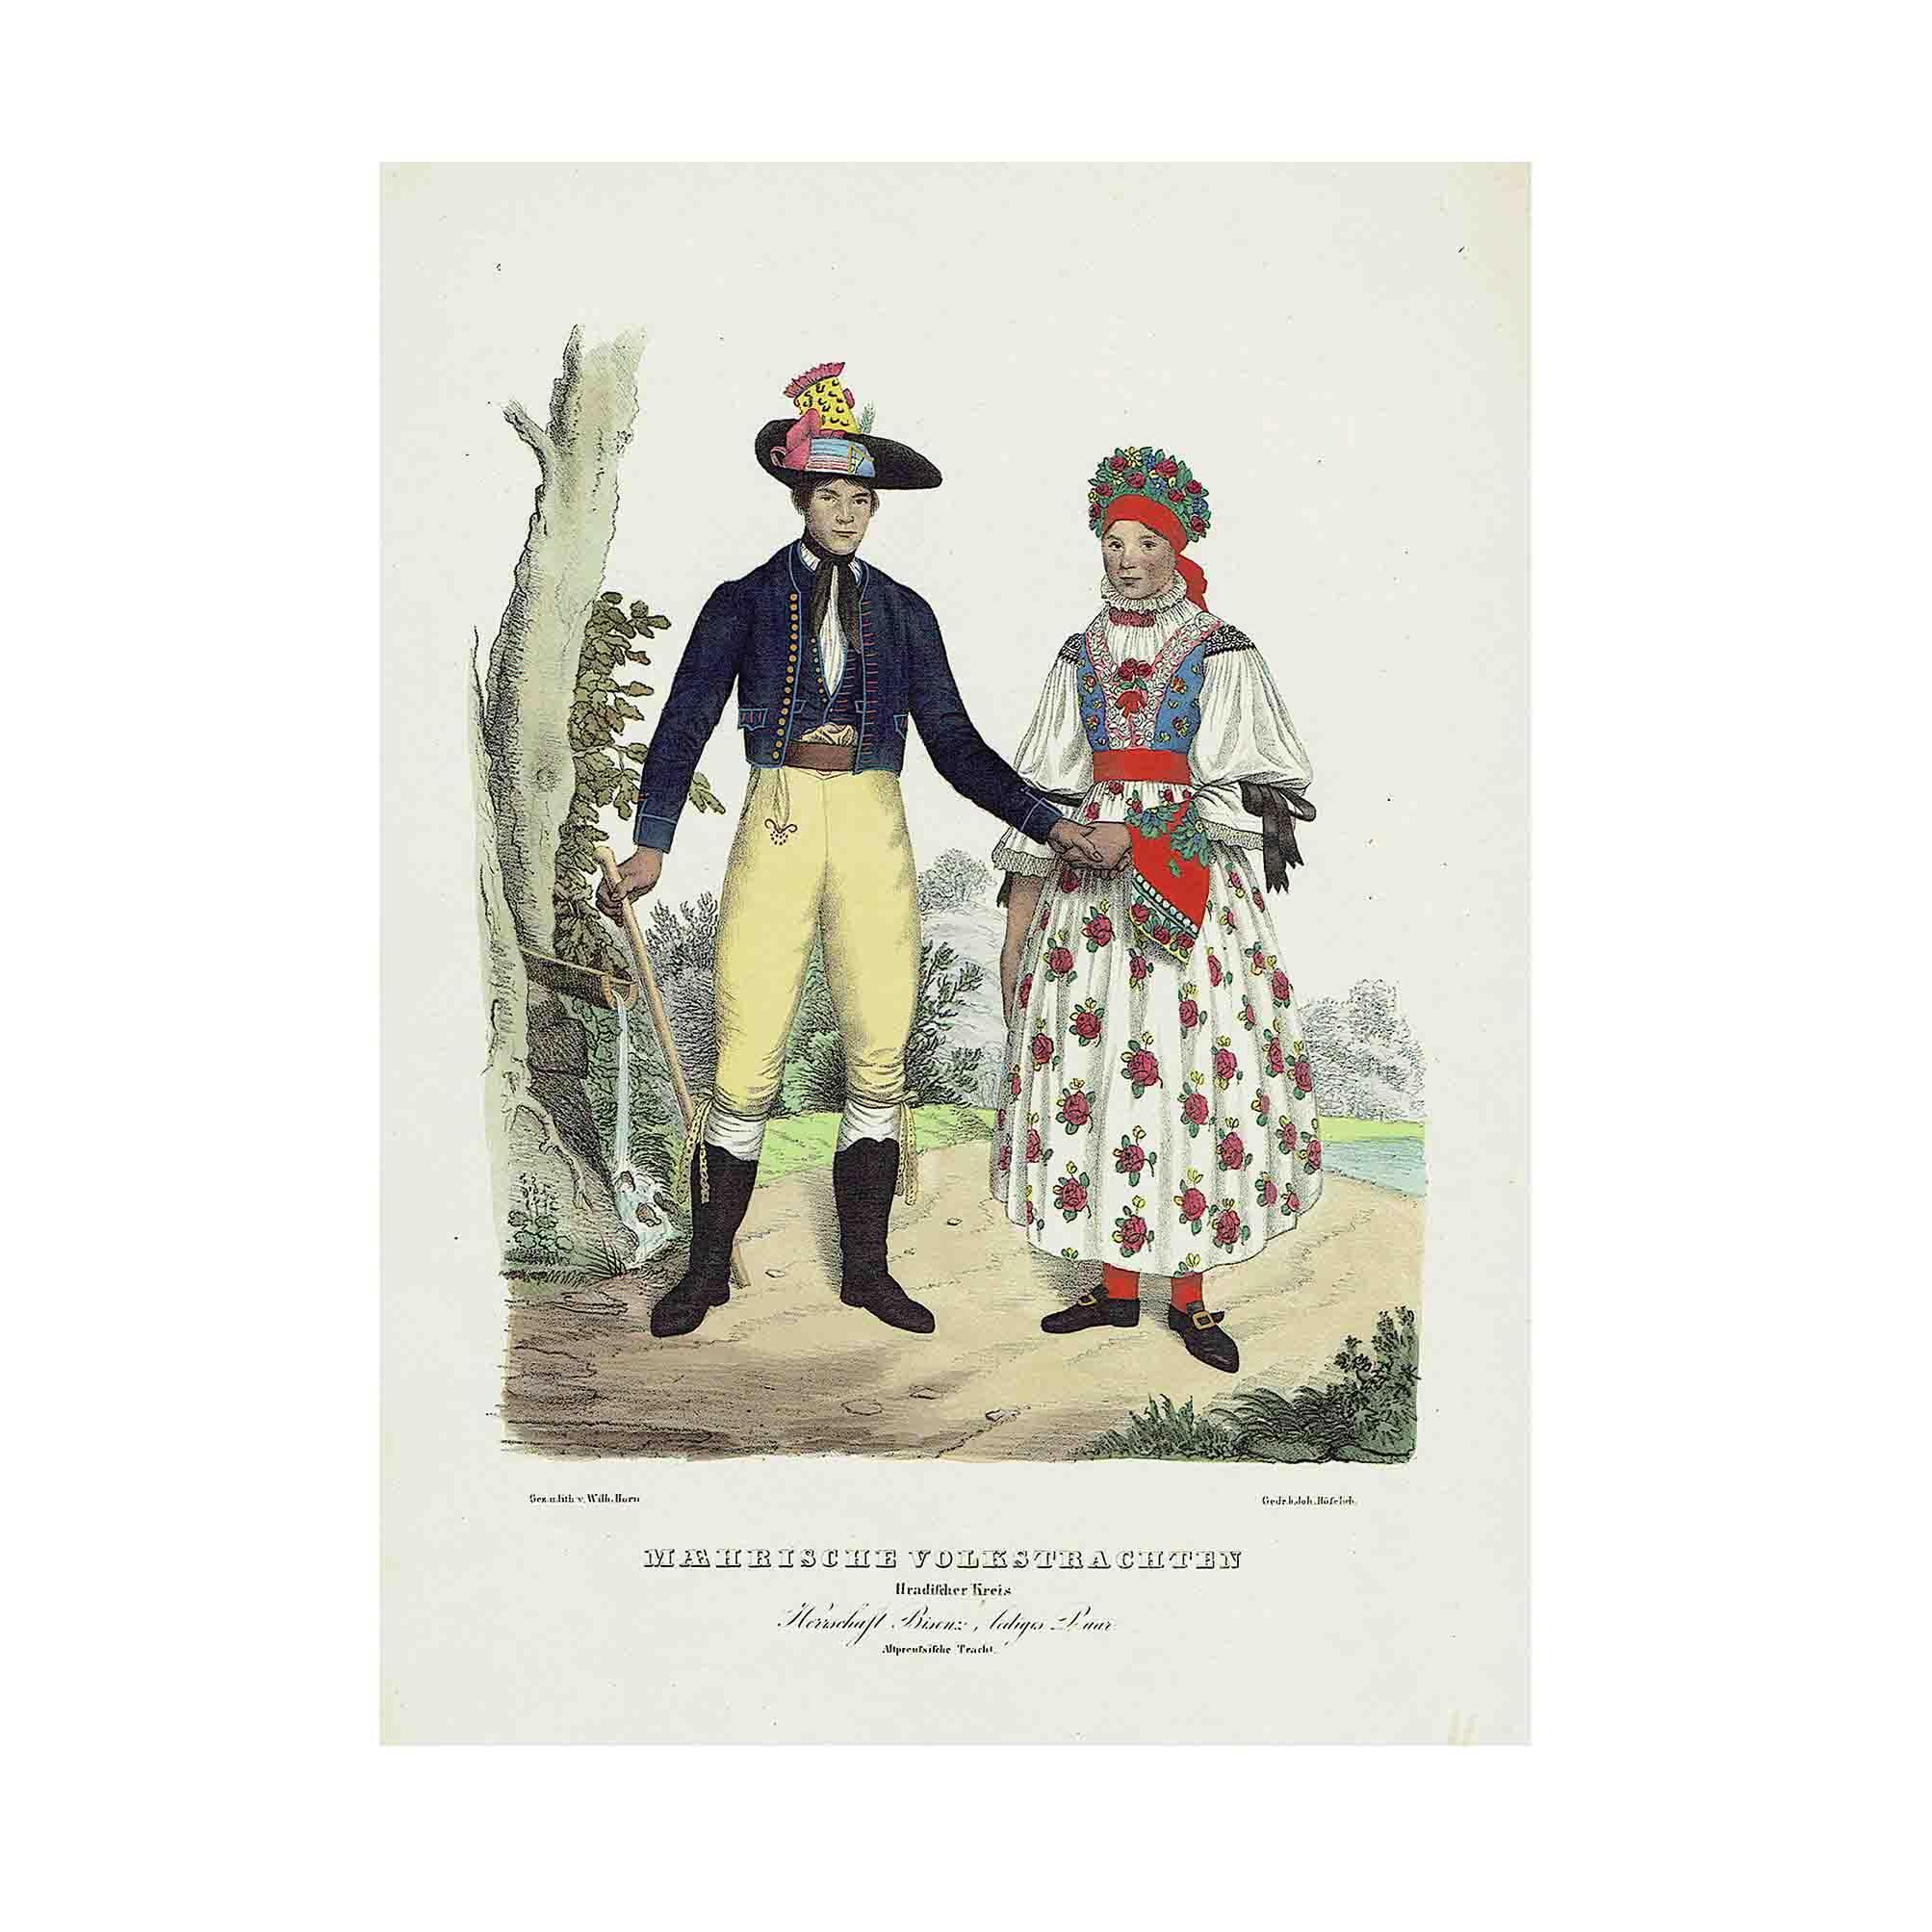 5573 Horn Maehrische Trachten 1837 Altpreussen N